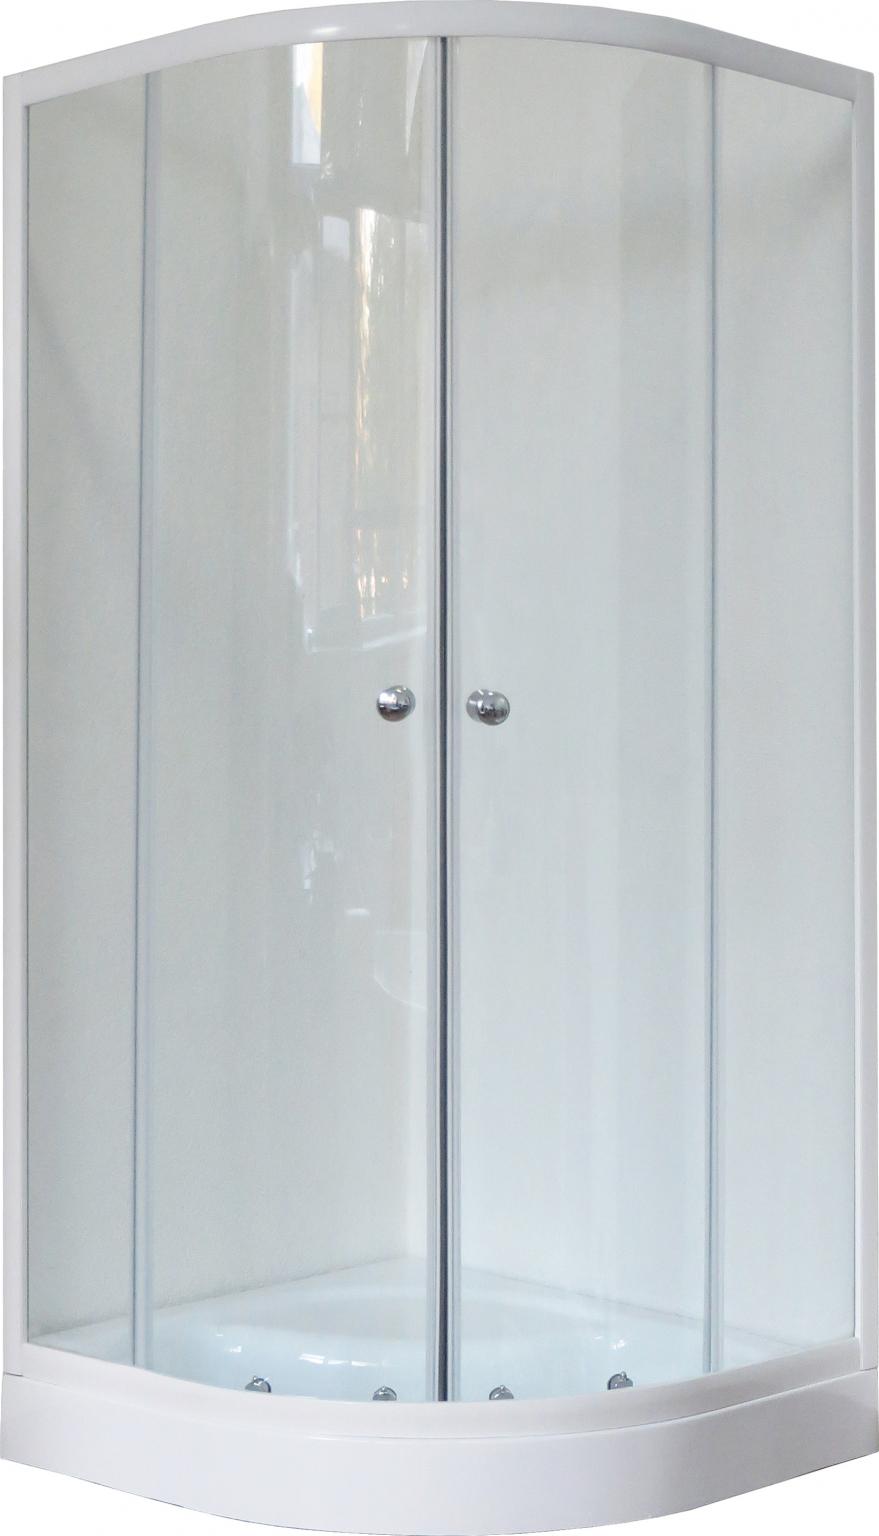 Душевой уголок Royal bath  90 см (RB 90HK-T)